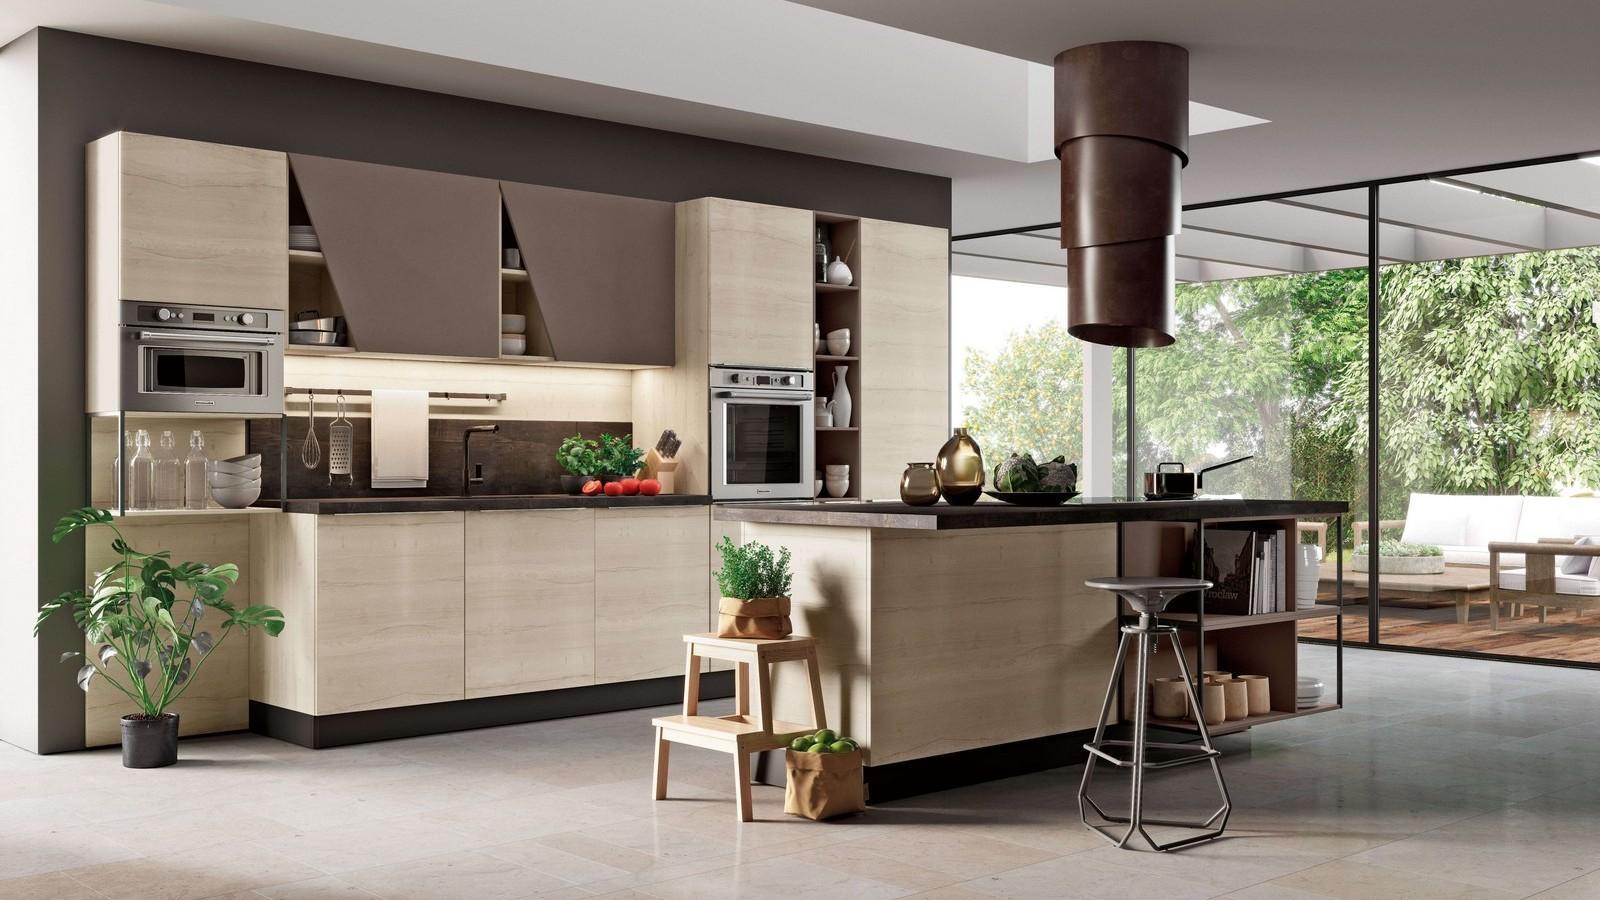 Vendita mobili online - Cucina componibile Ivrea | offerte ...